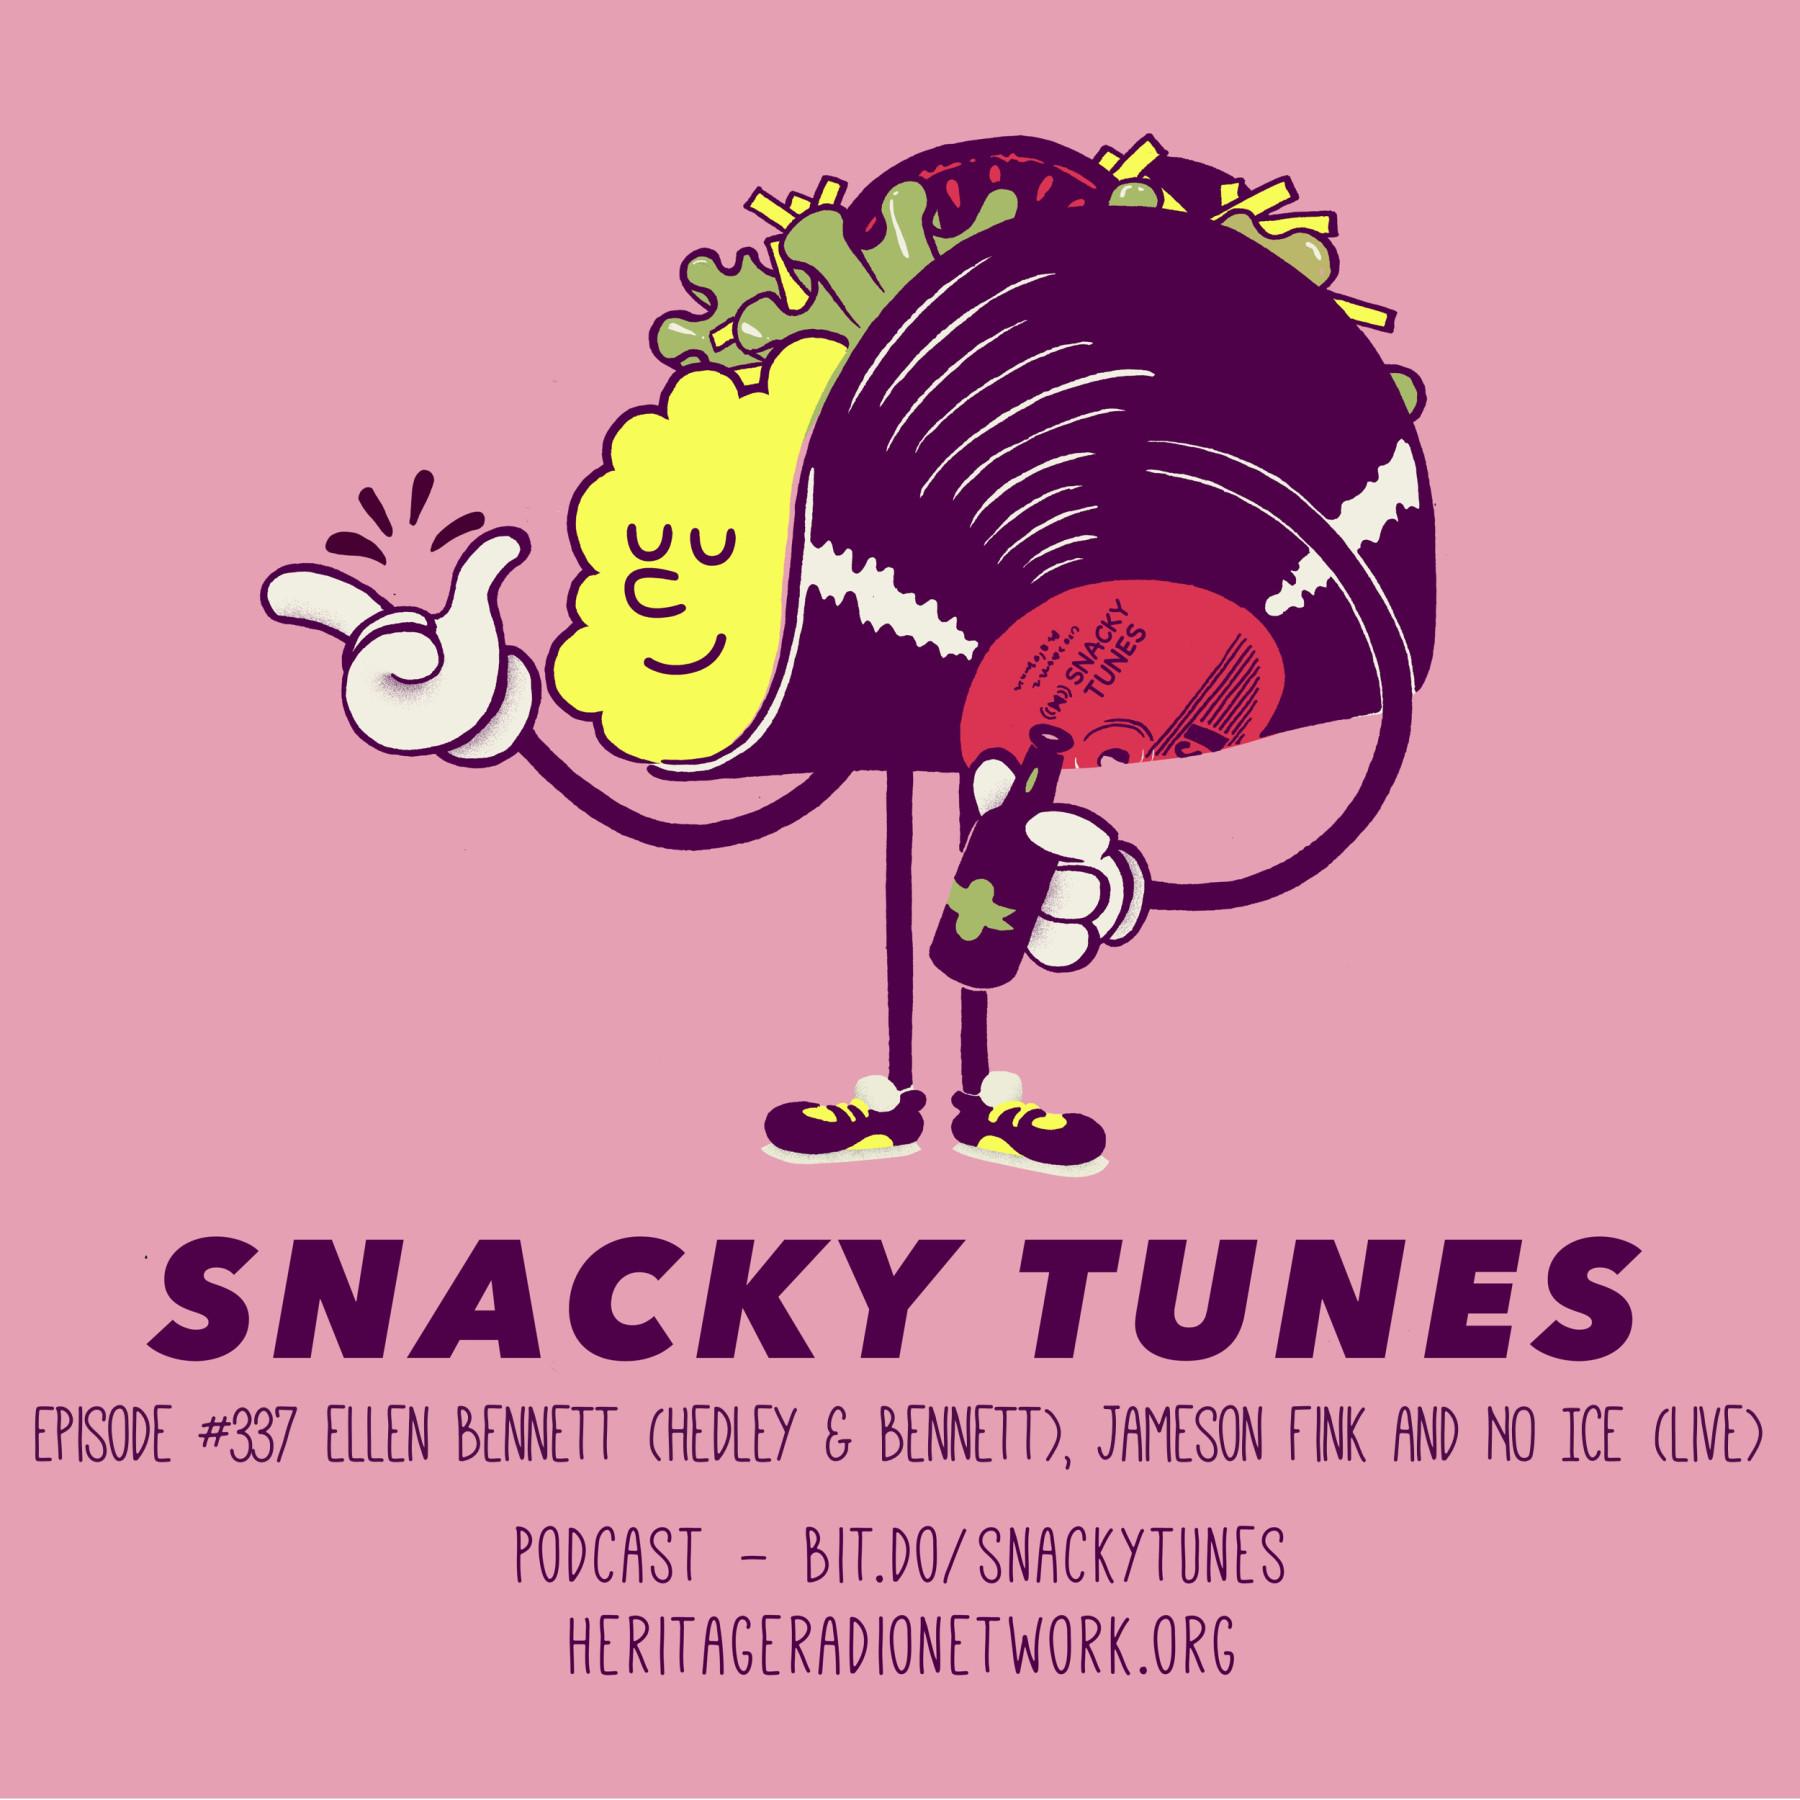 Snacky_Tunes-Podacst_Editable_337.001